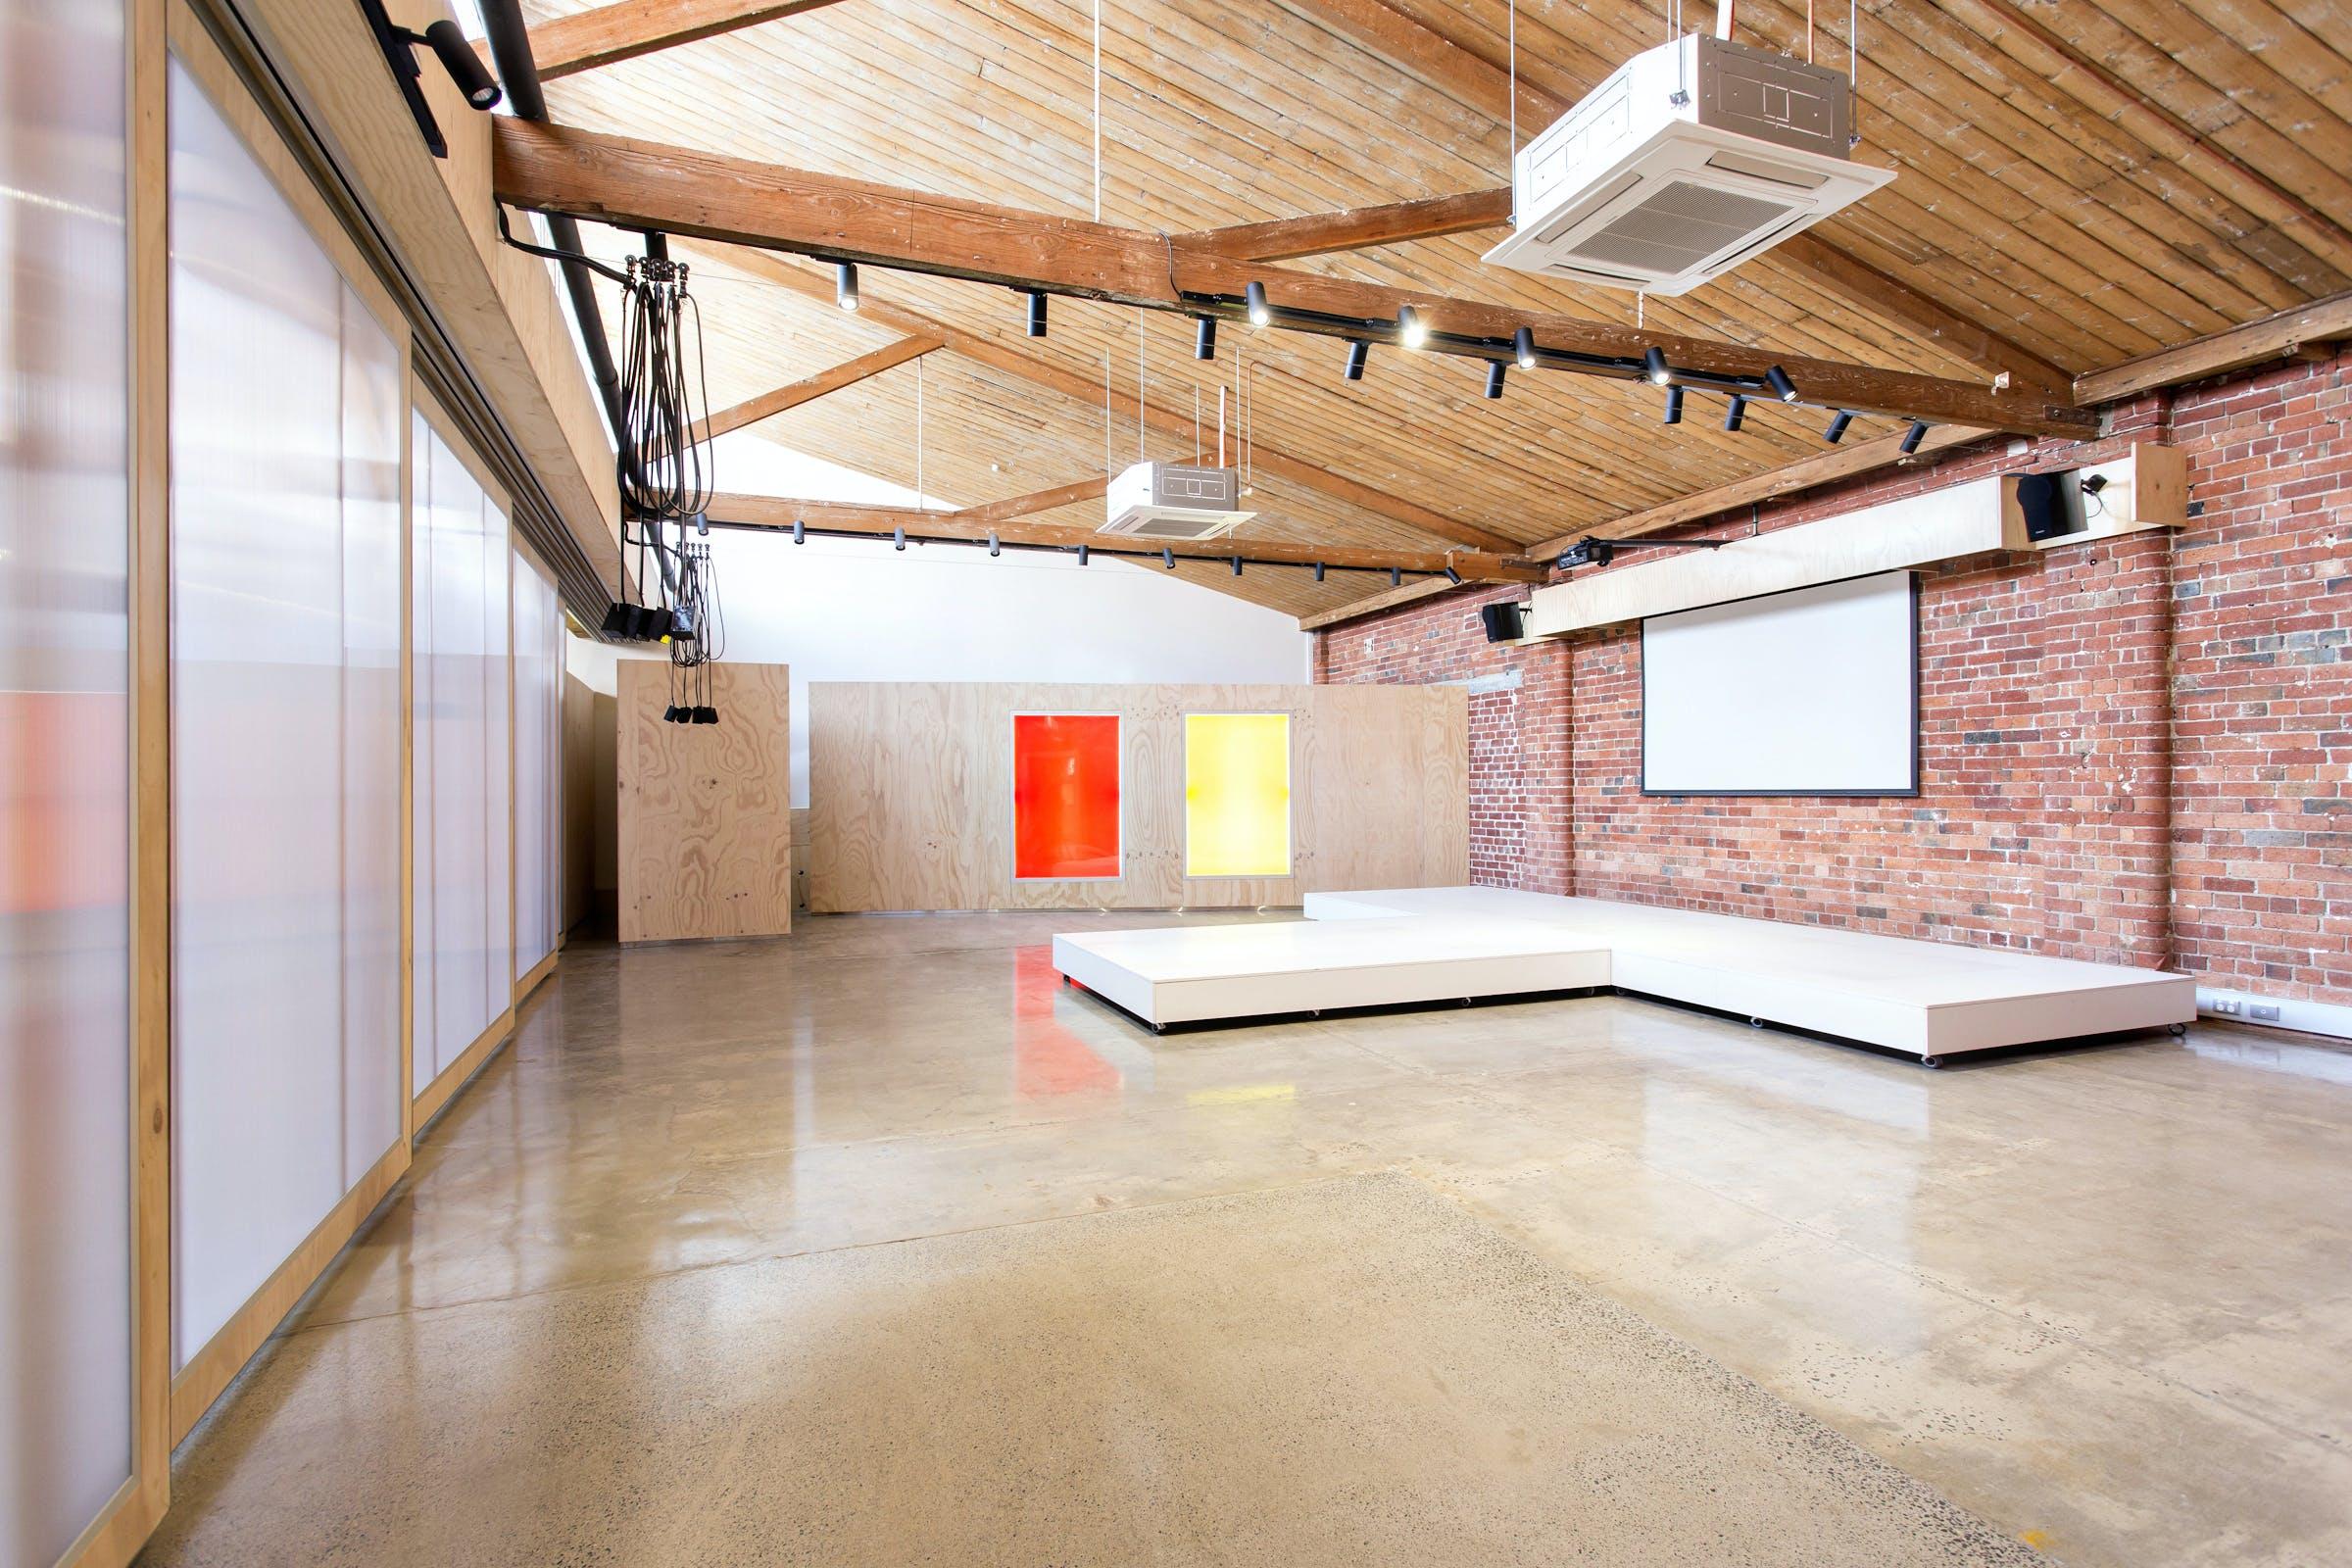 Studio 2, creative studio at 73 Cromwell, image 1